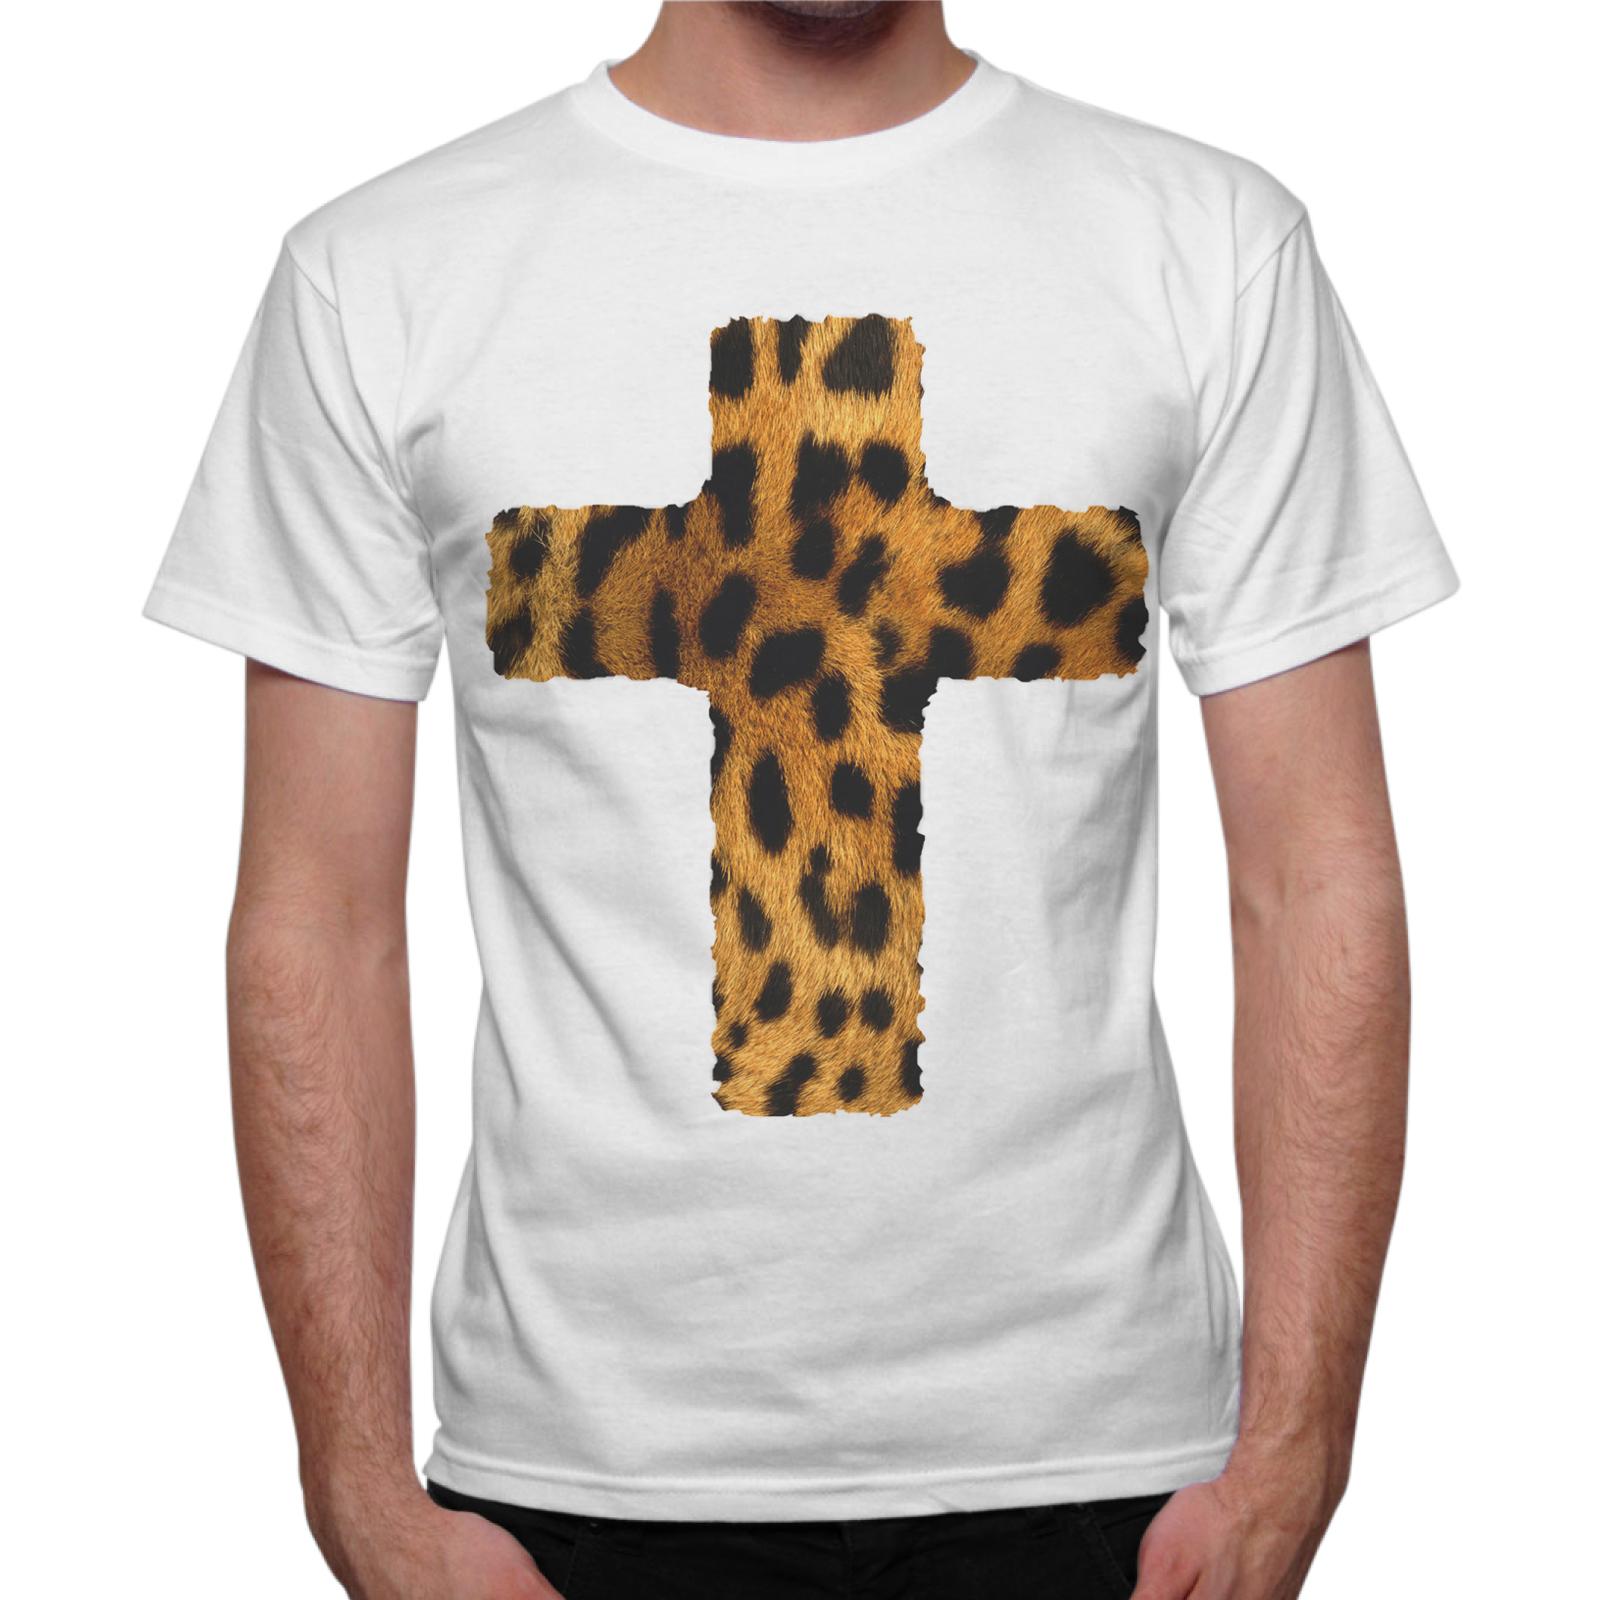 T-Shirt Uomo CROCE LEOPARDATA 1